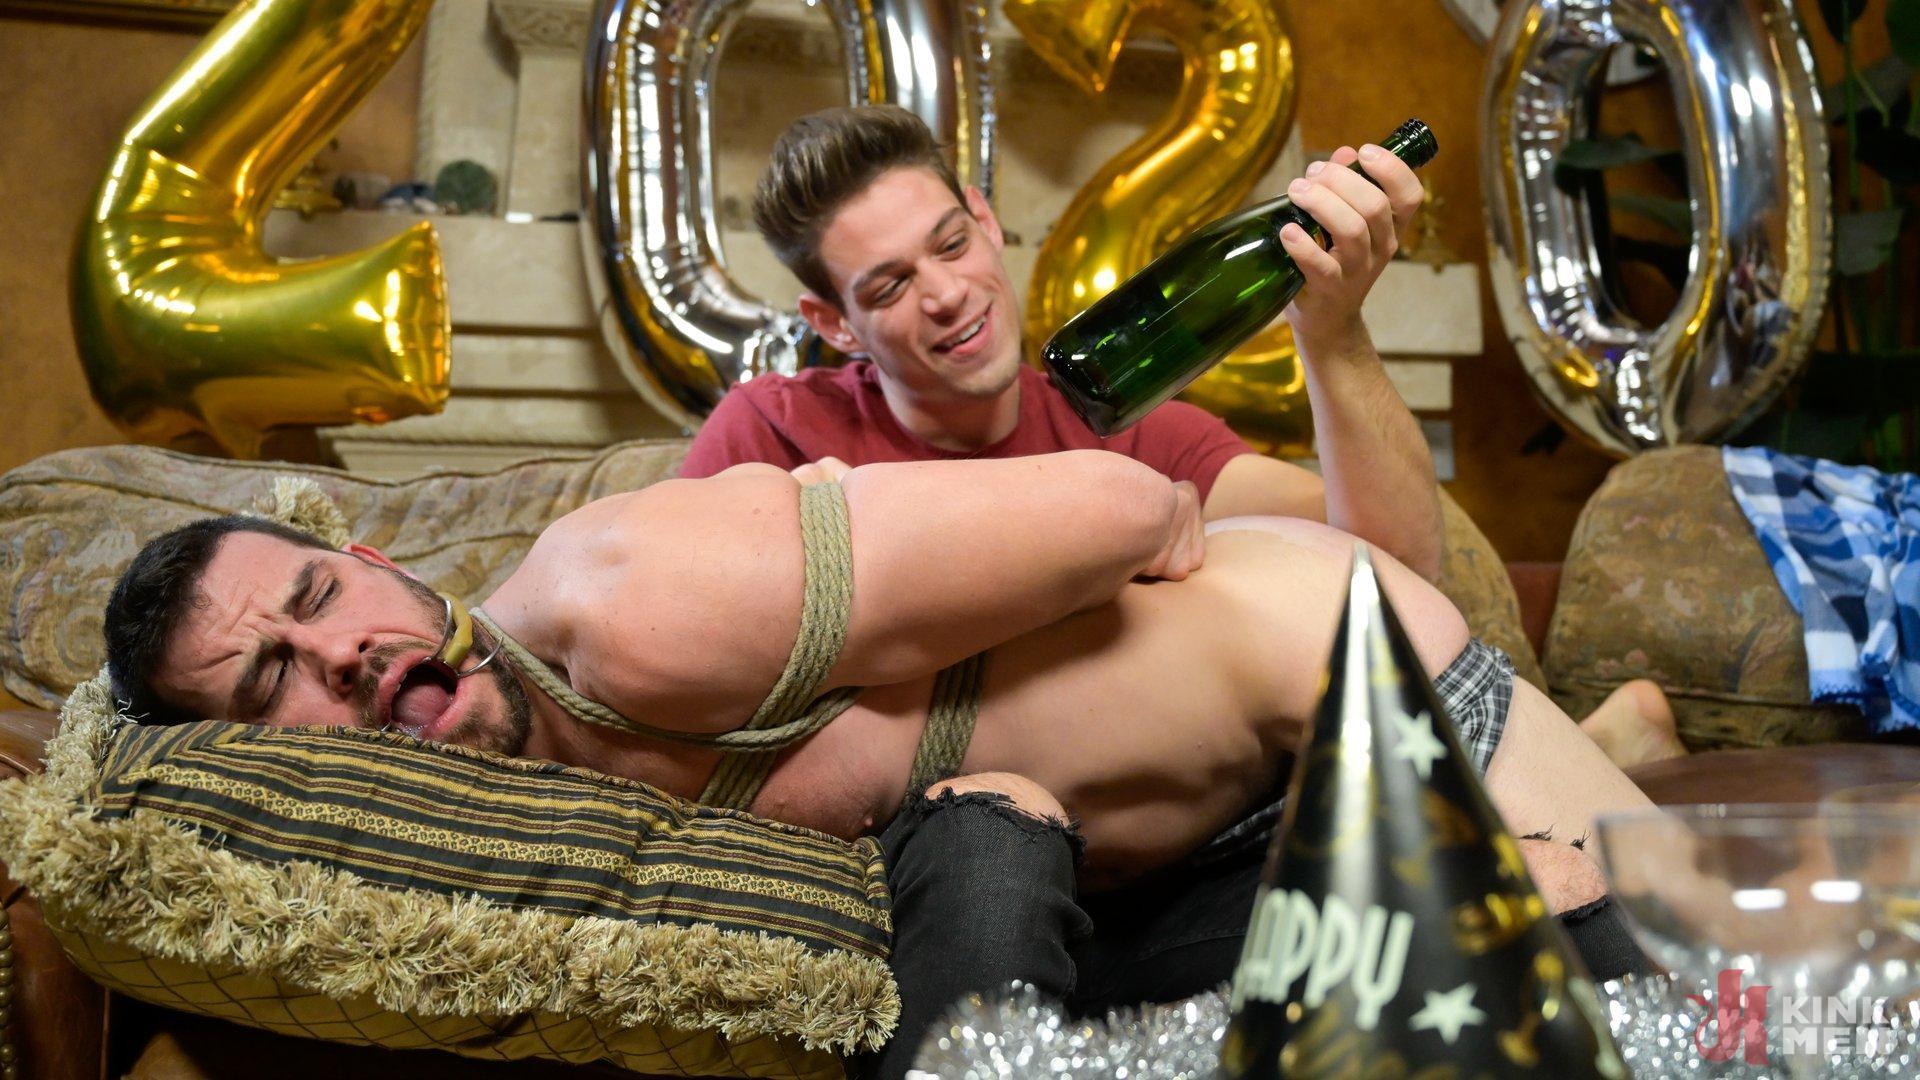 Photo number 4 from Homo Alone Part 2: Pizza Man Michael DelRay Punishes Vander Pulaski shot for Bound Gods on Kink.com. Featuring Michael DelRay and Vander Pulaski in hardcore BDSM & Fetish porn.